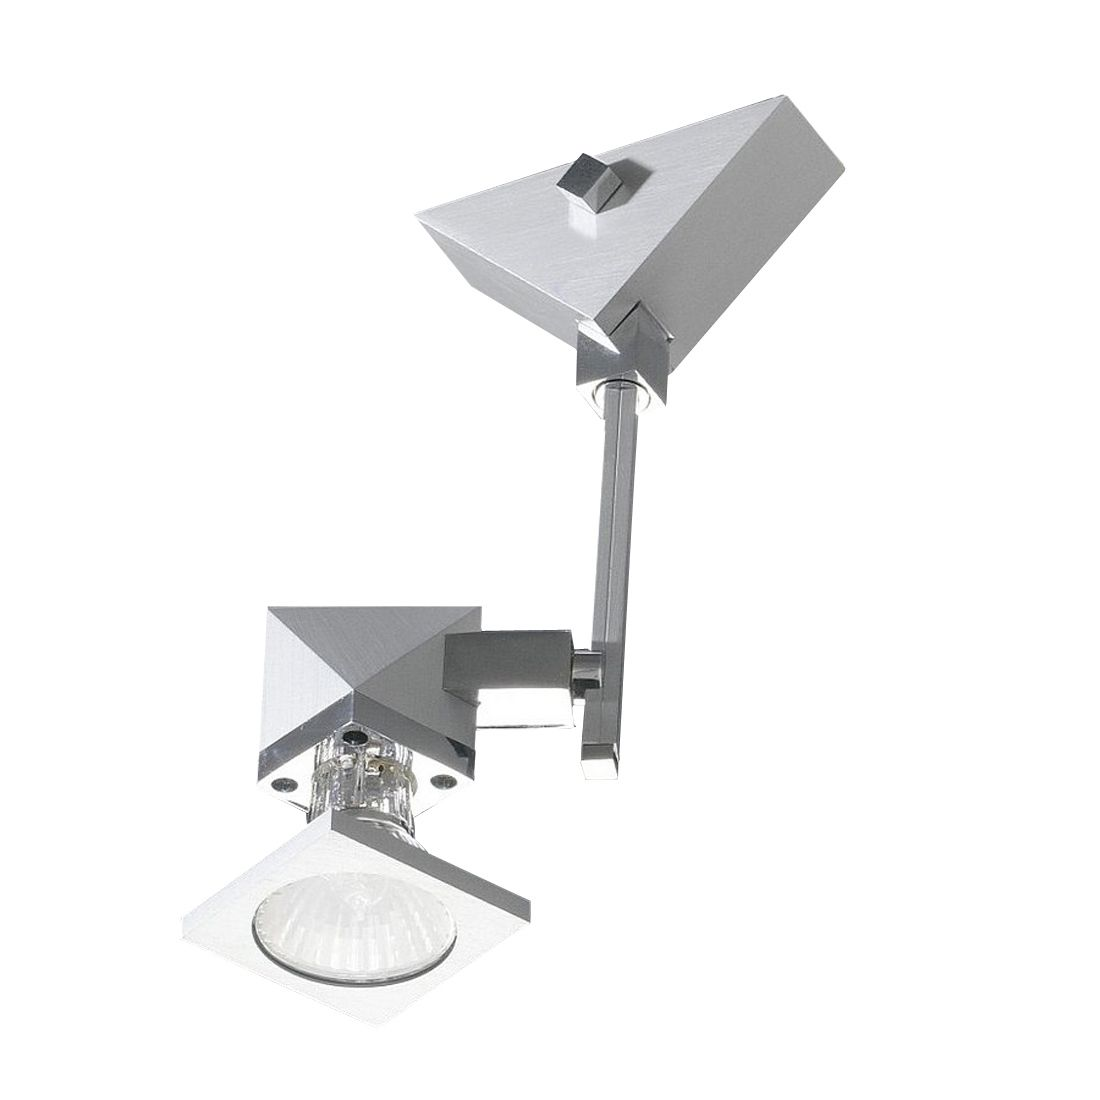 Decken--Wandstrahler Alutop S1 - 1-flammig - Aluminium-Chrom, In-Nova Design